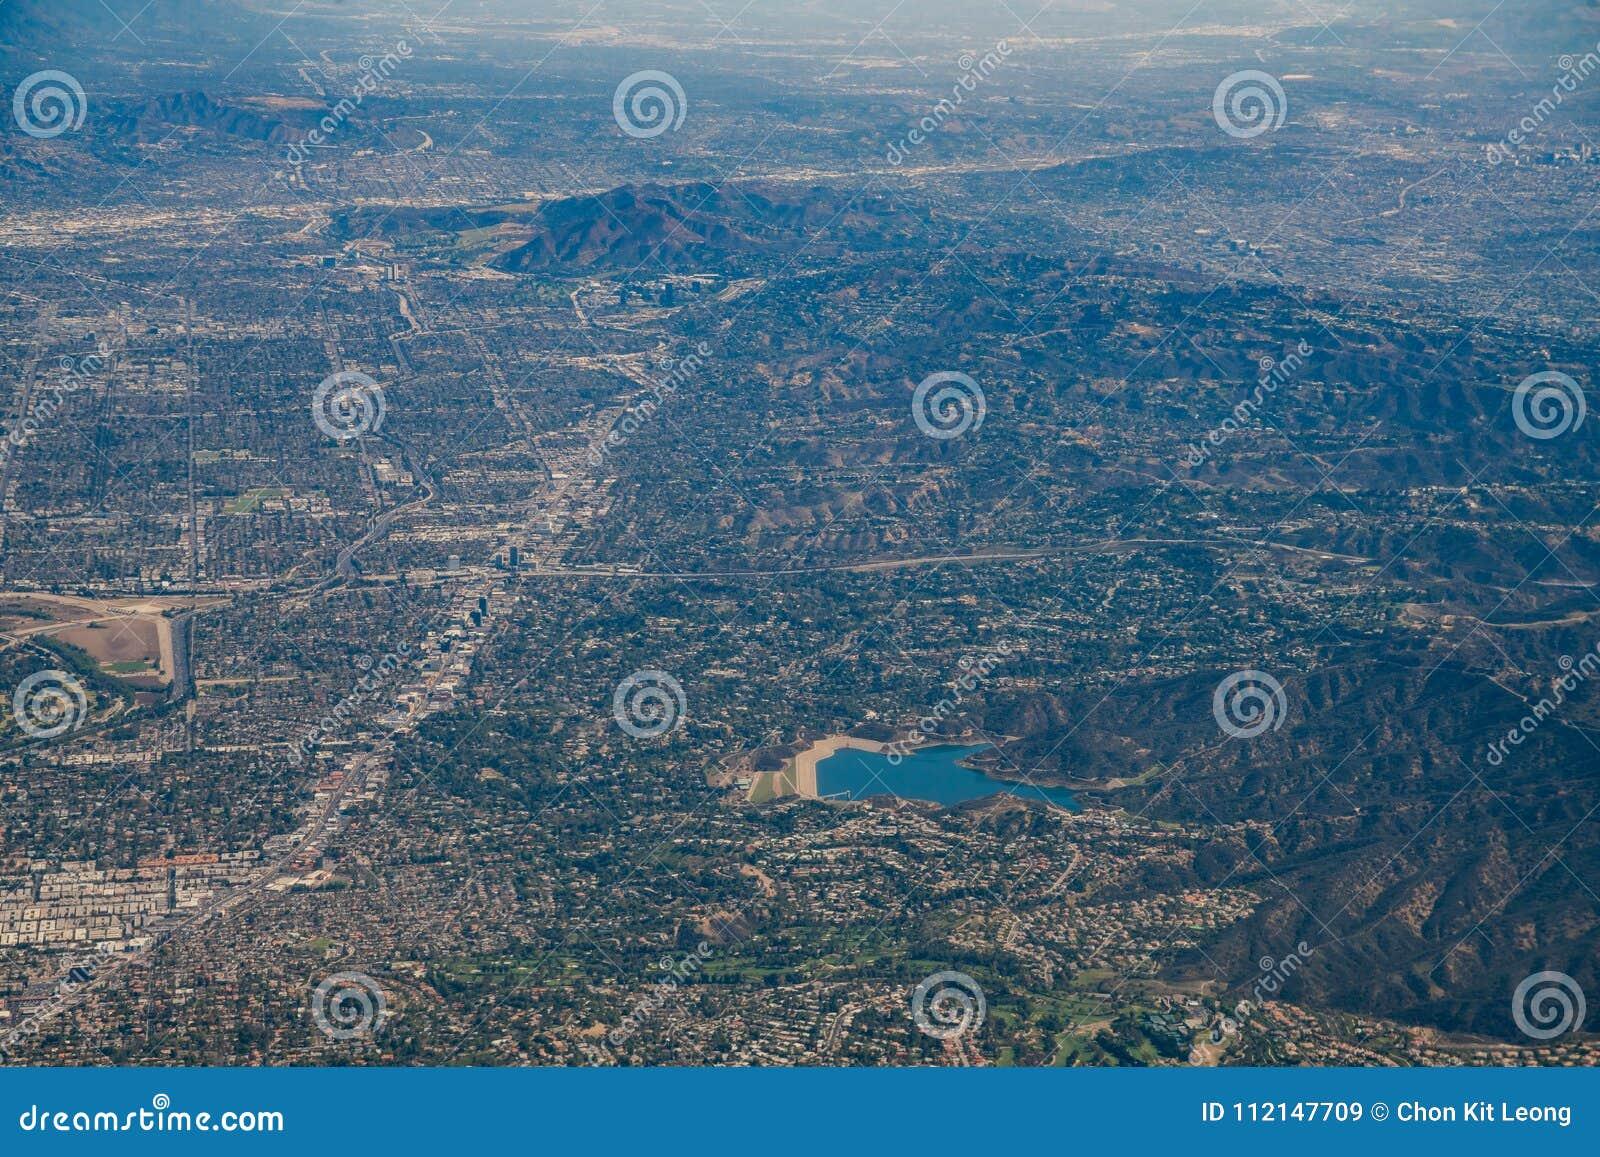 Vista aérea do reservatório de Encino, Van Nuys, Sherman Oaks, H norte